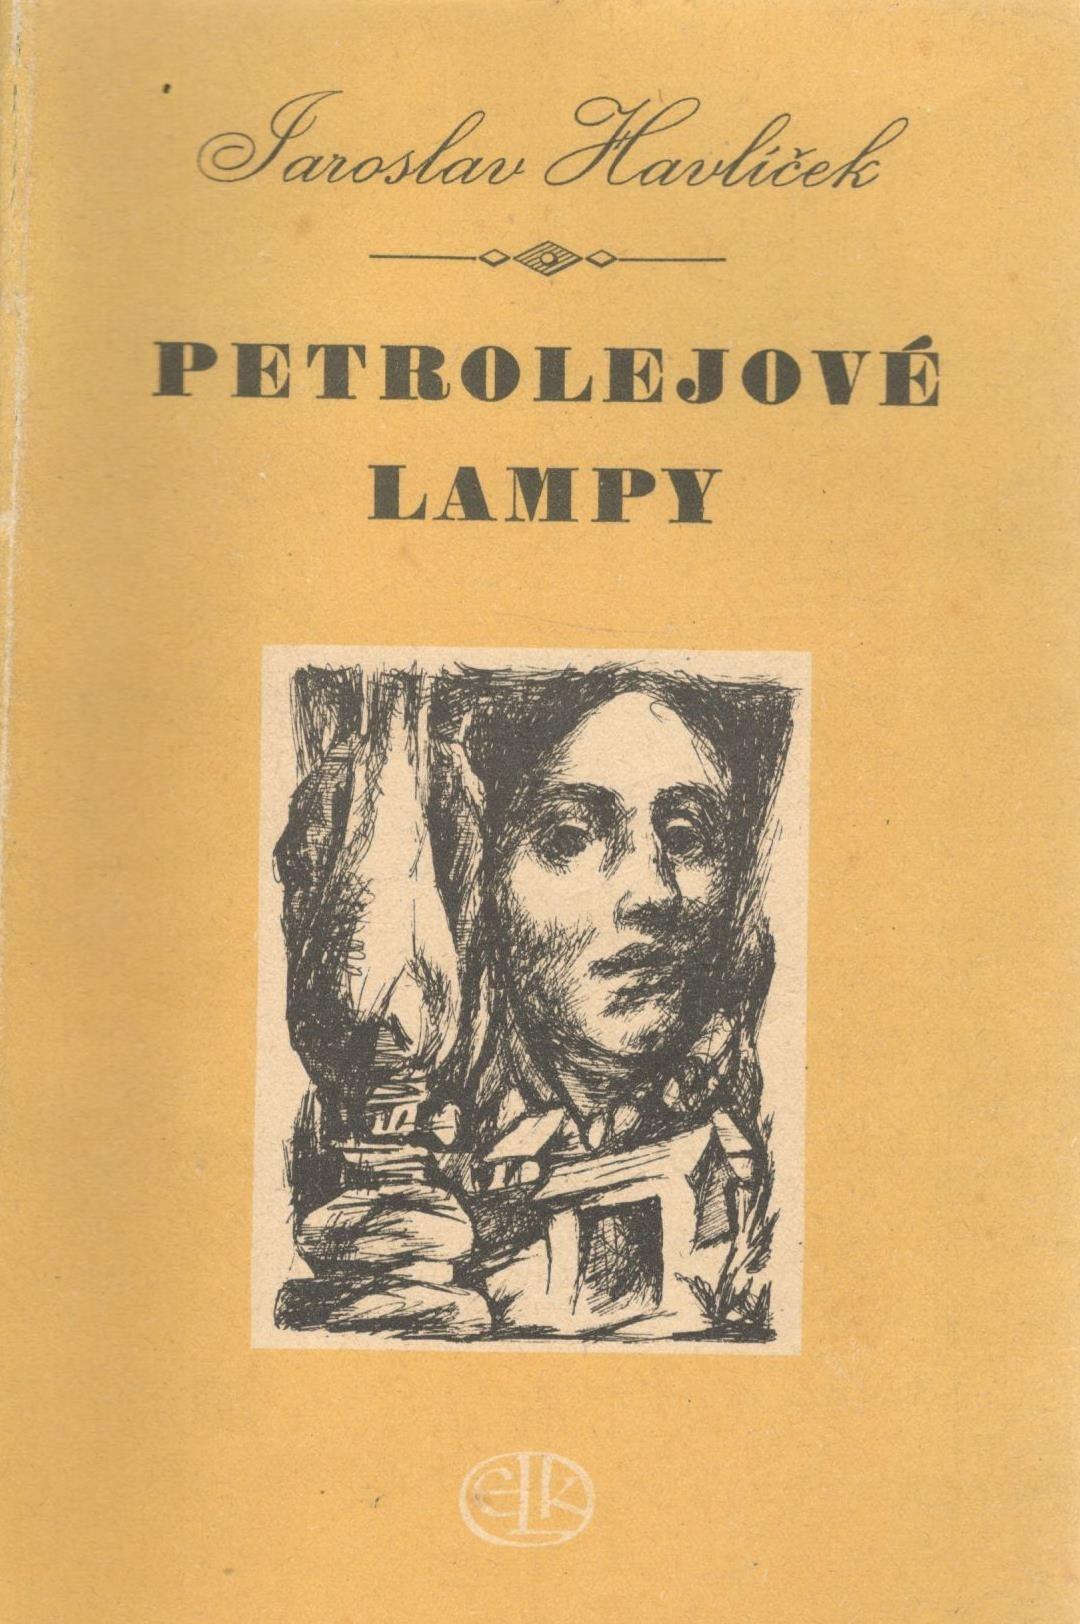 petrolejove lampy